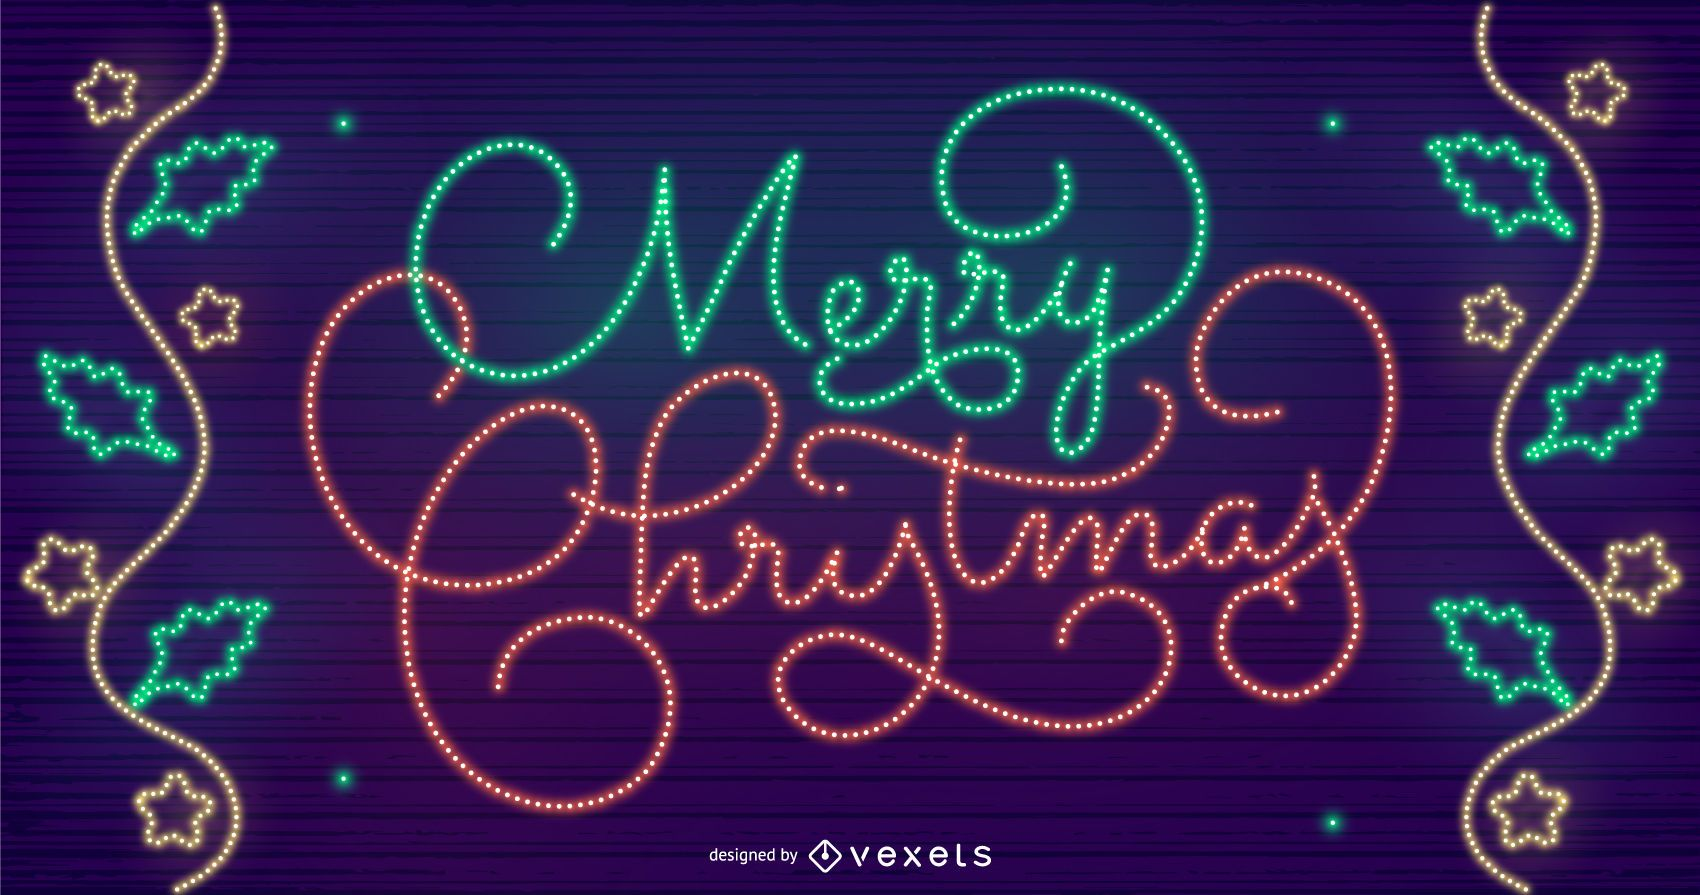 Schriftzug Frohe Weihnachten Beleuchtet.Frohe Weihnachten Beleuchtet Hintergrunddesign Vektor Download